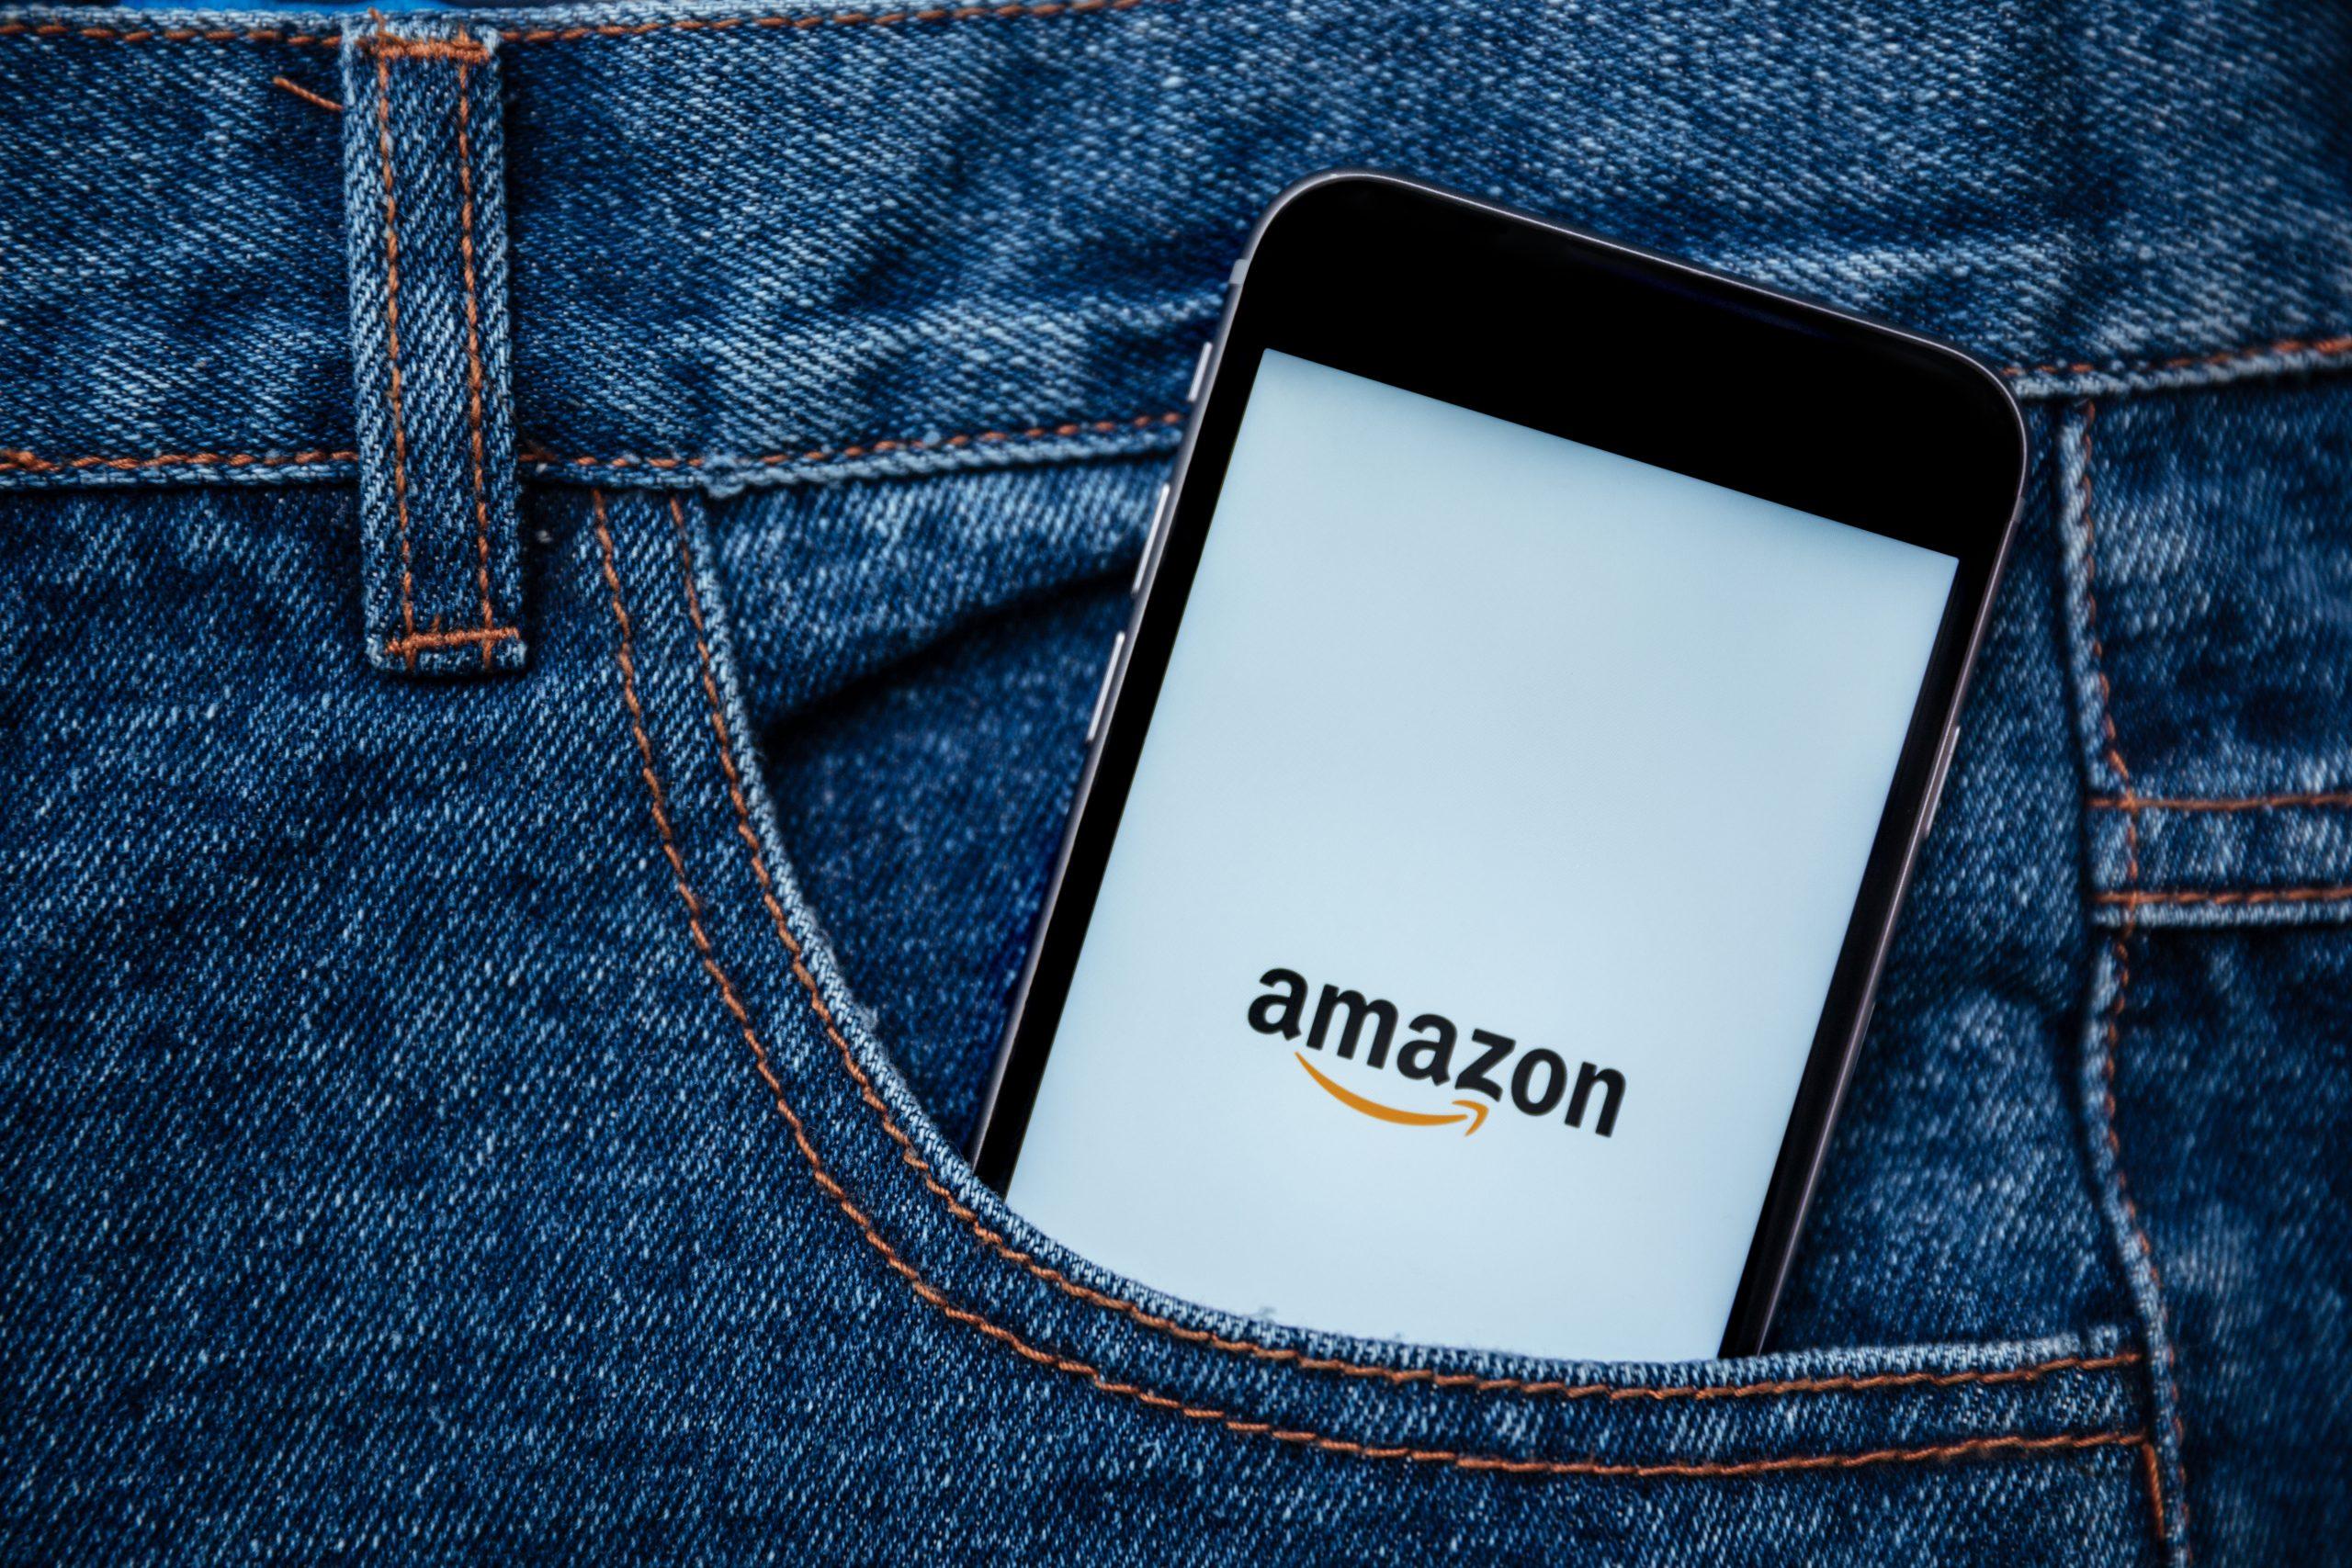 Antitrust - https://depositphotos.com/125587890/stock-photo-amazon-the-largest-internet-retailer.html